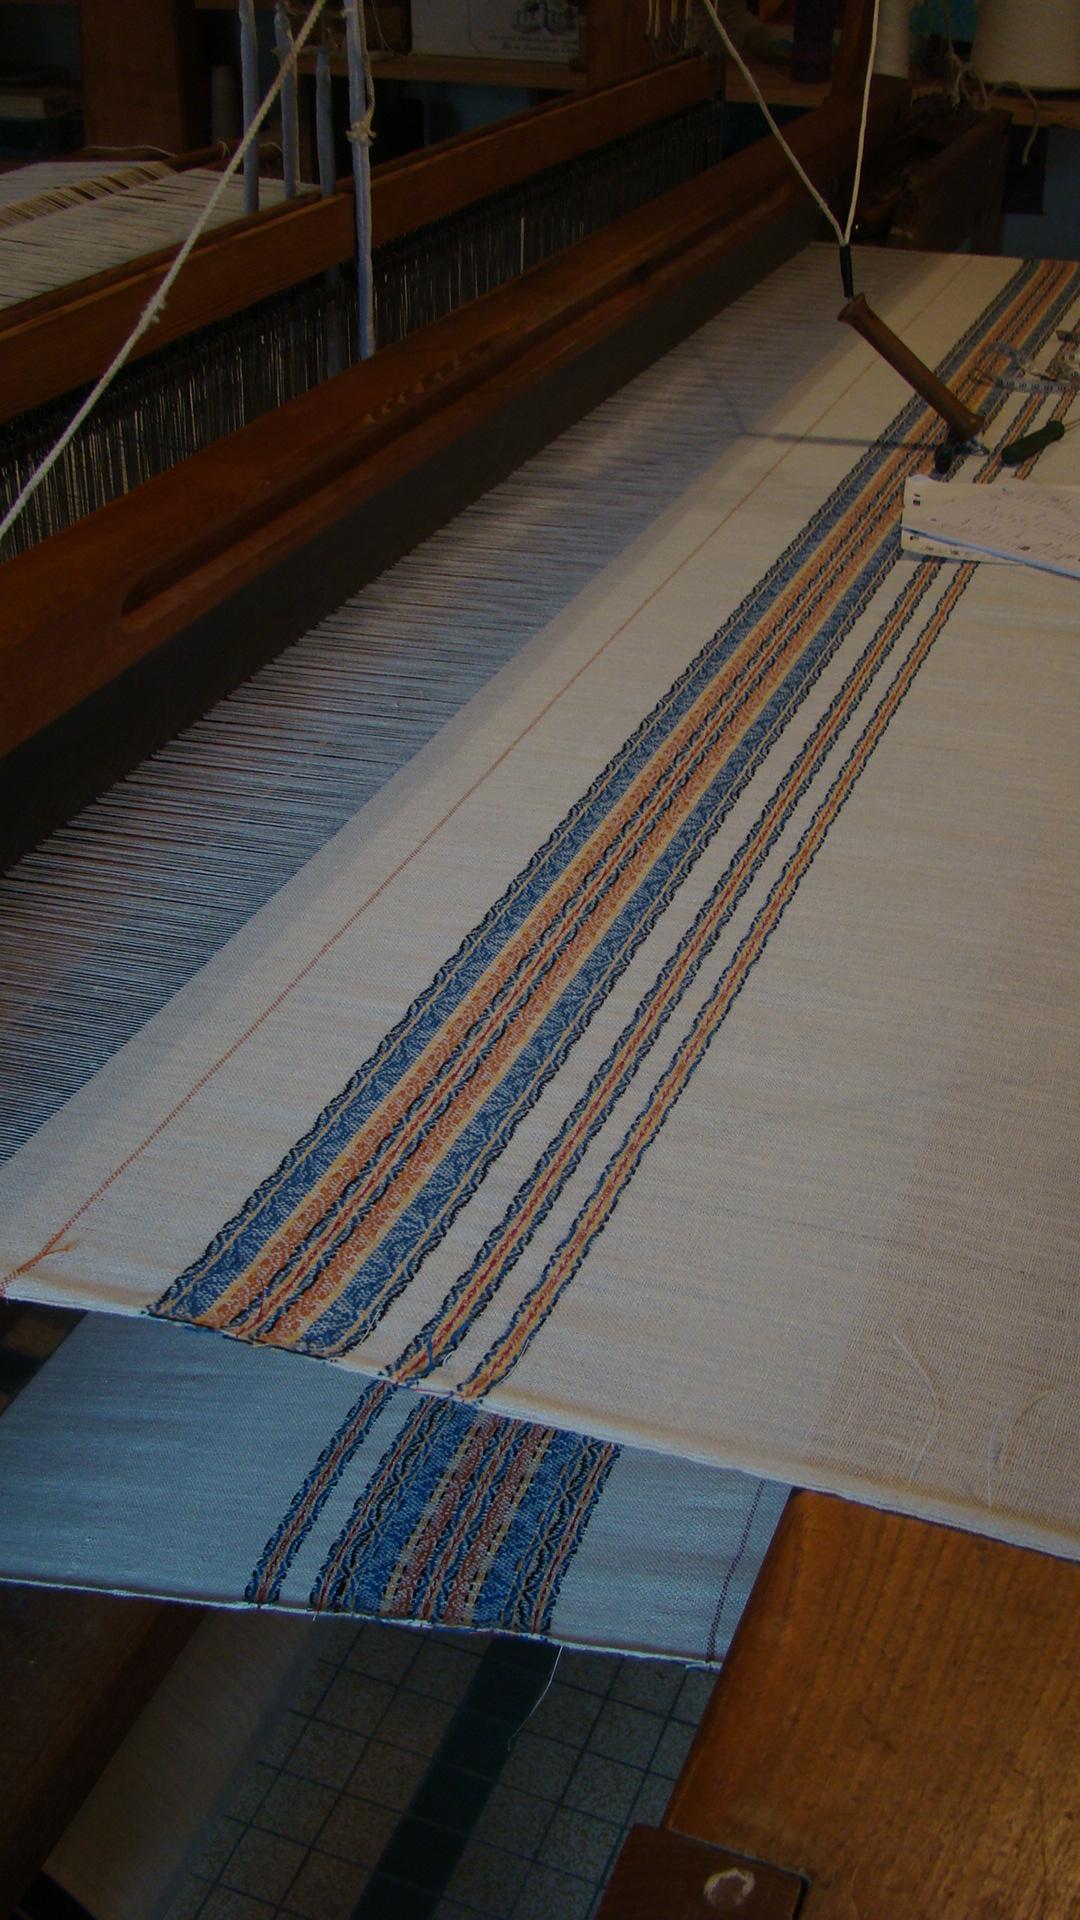 Produits du tissage artisanal de Locronan